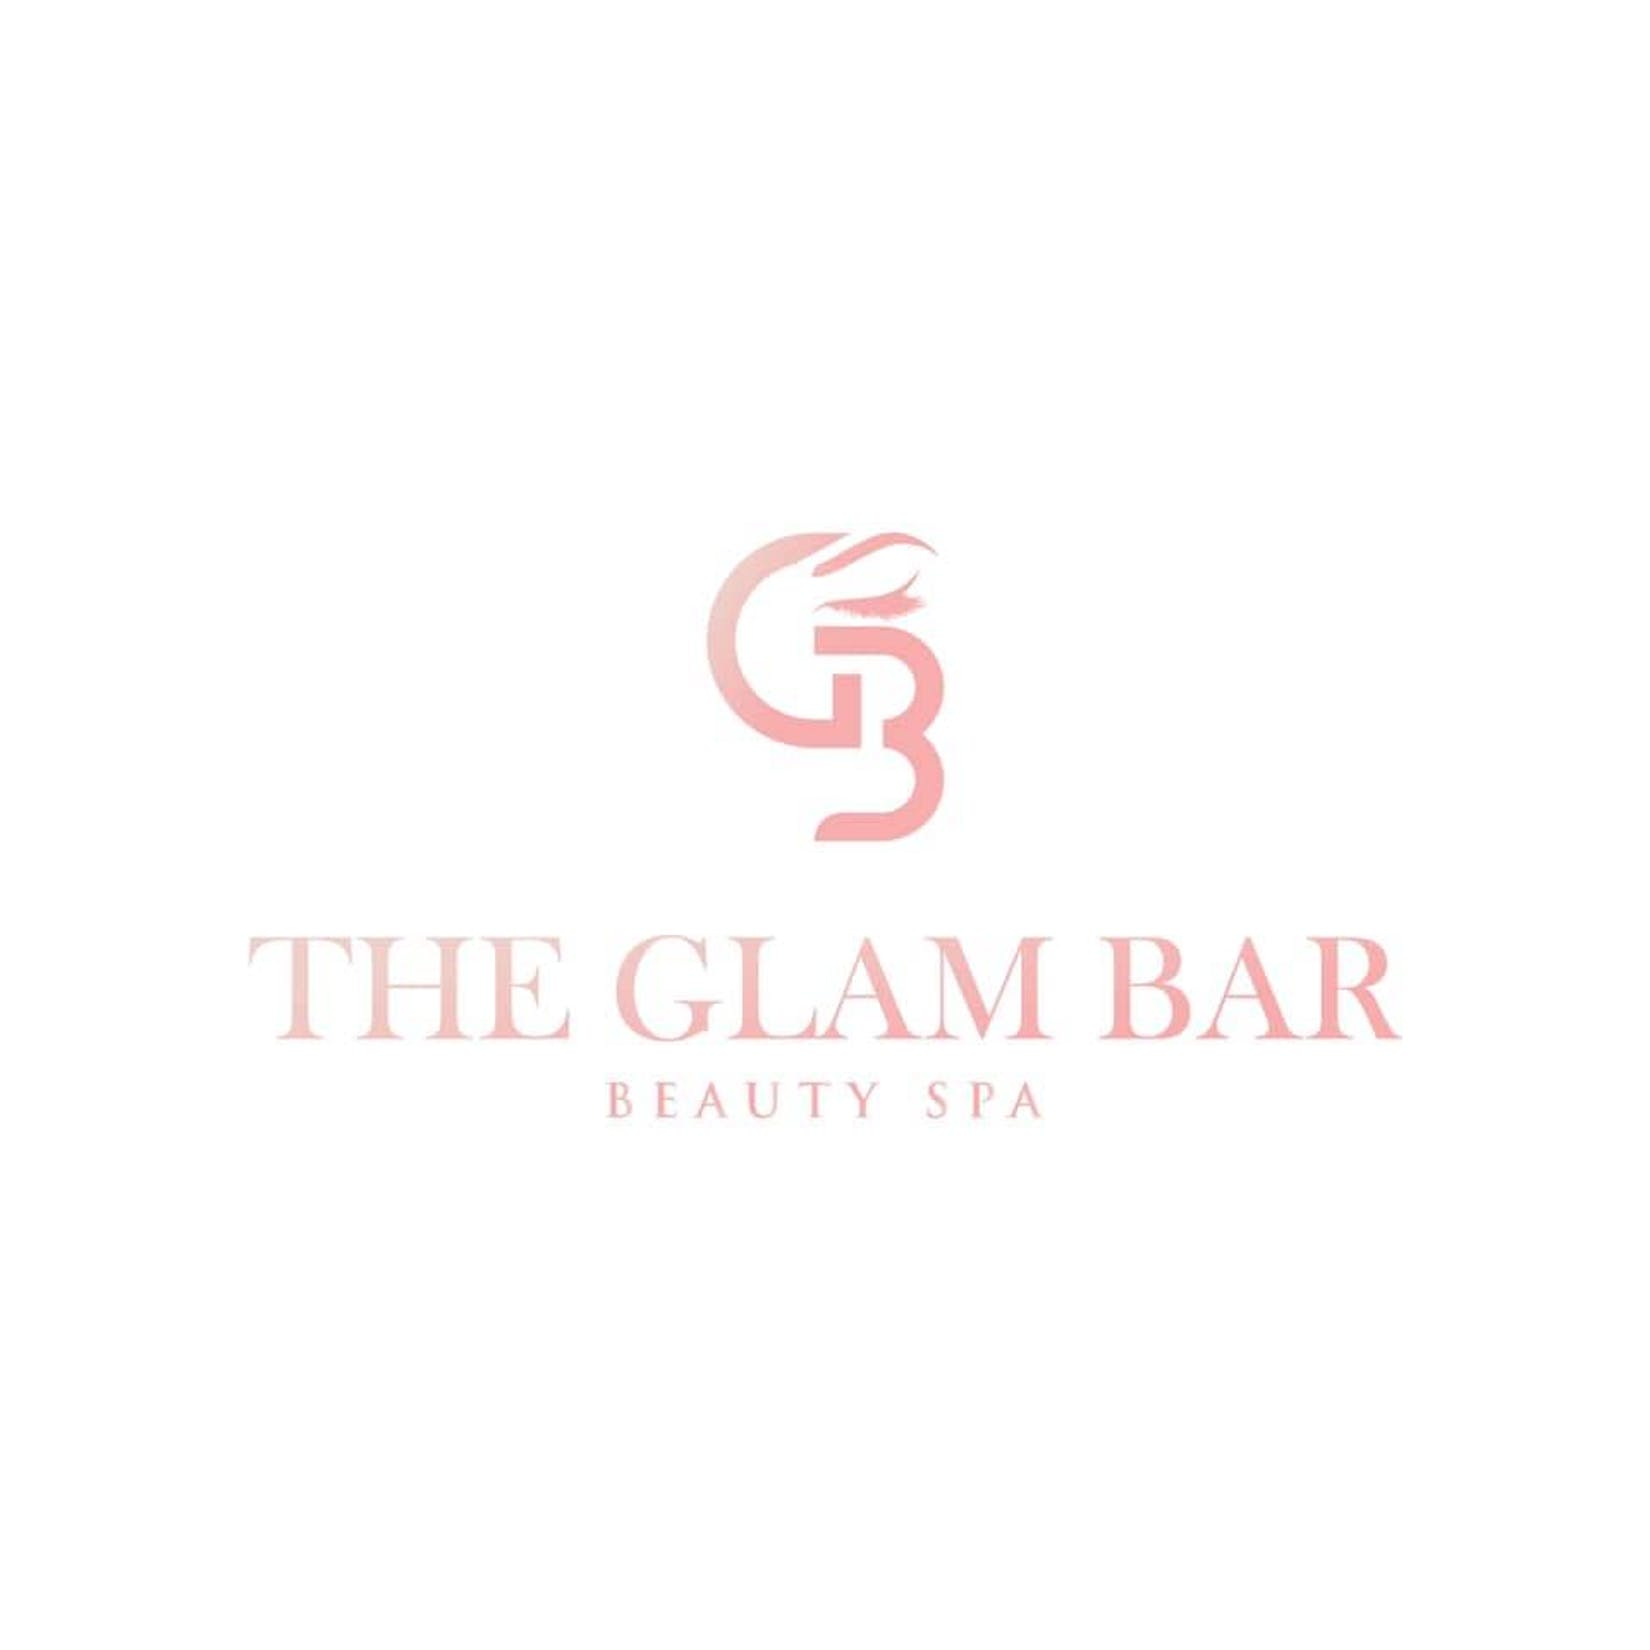 The Glam Bar Beauty Spa | Beauty